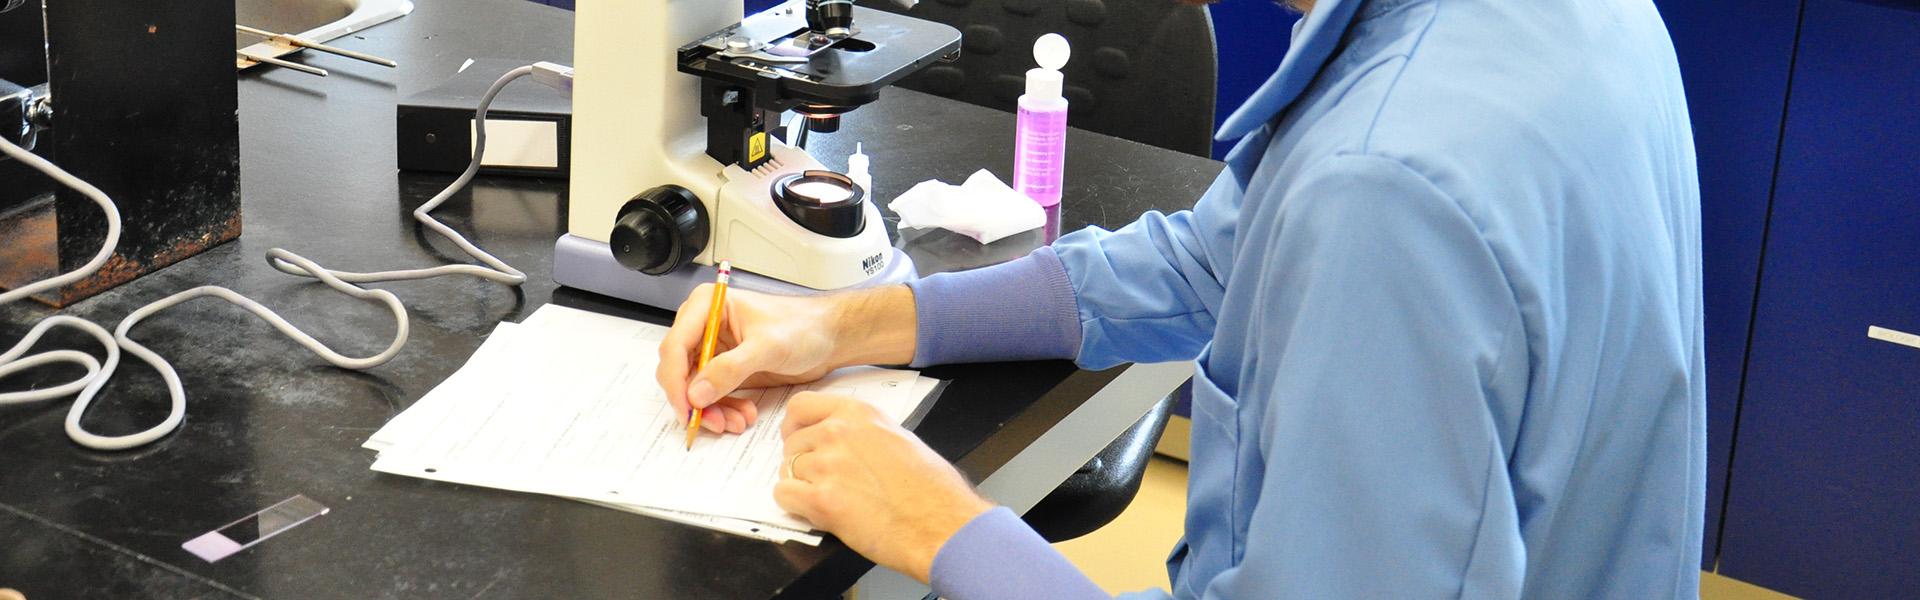 Prise de notes d'observation en microbiologie